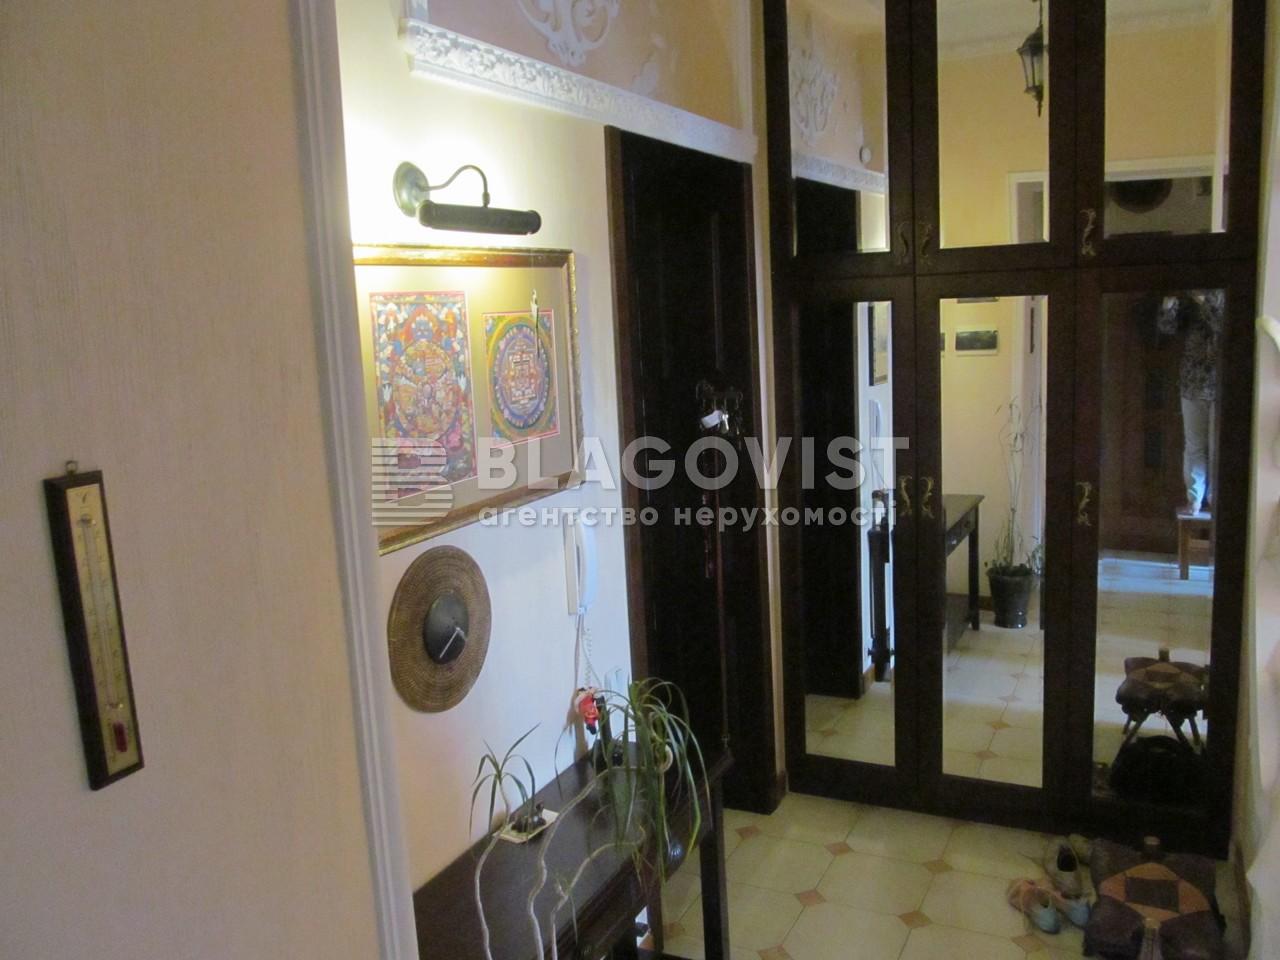 Квартира C-103021, Деловая (Димитрова), 13, Киев - Фото 13